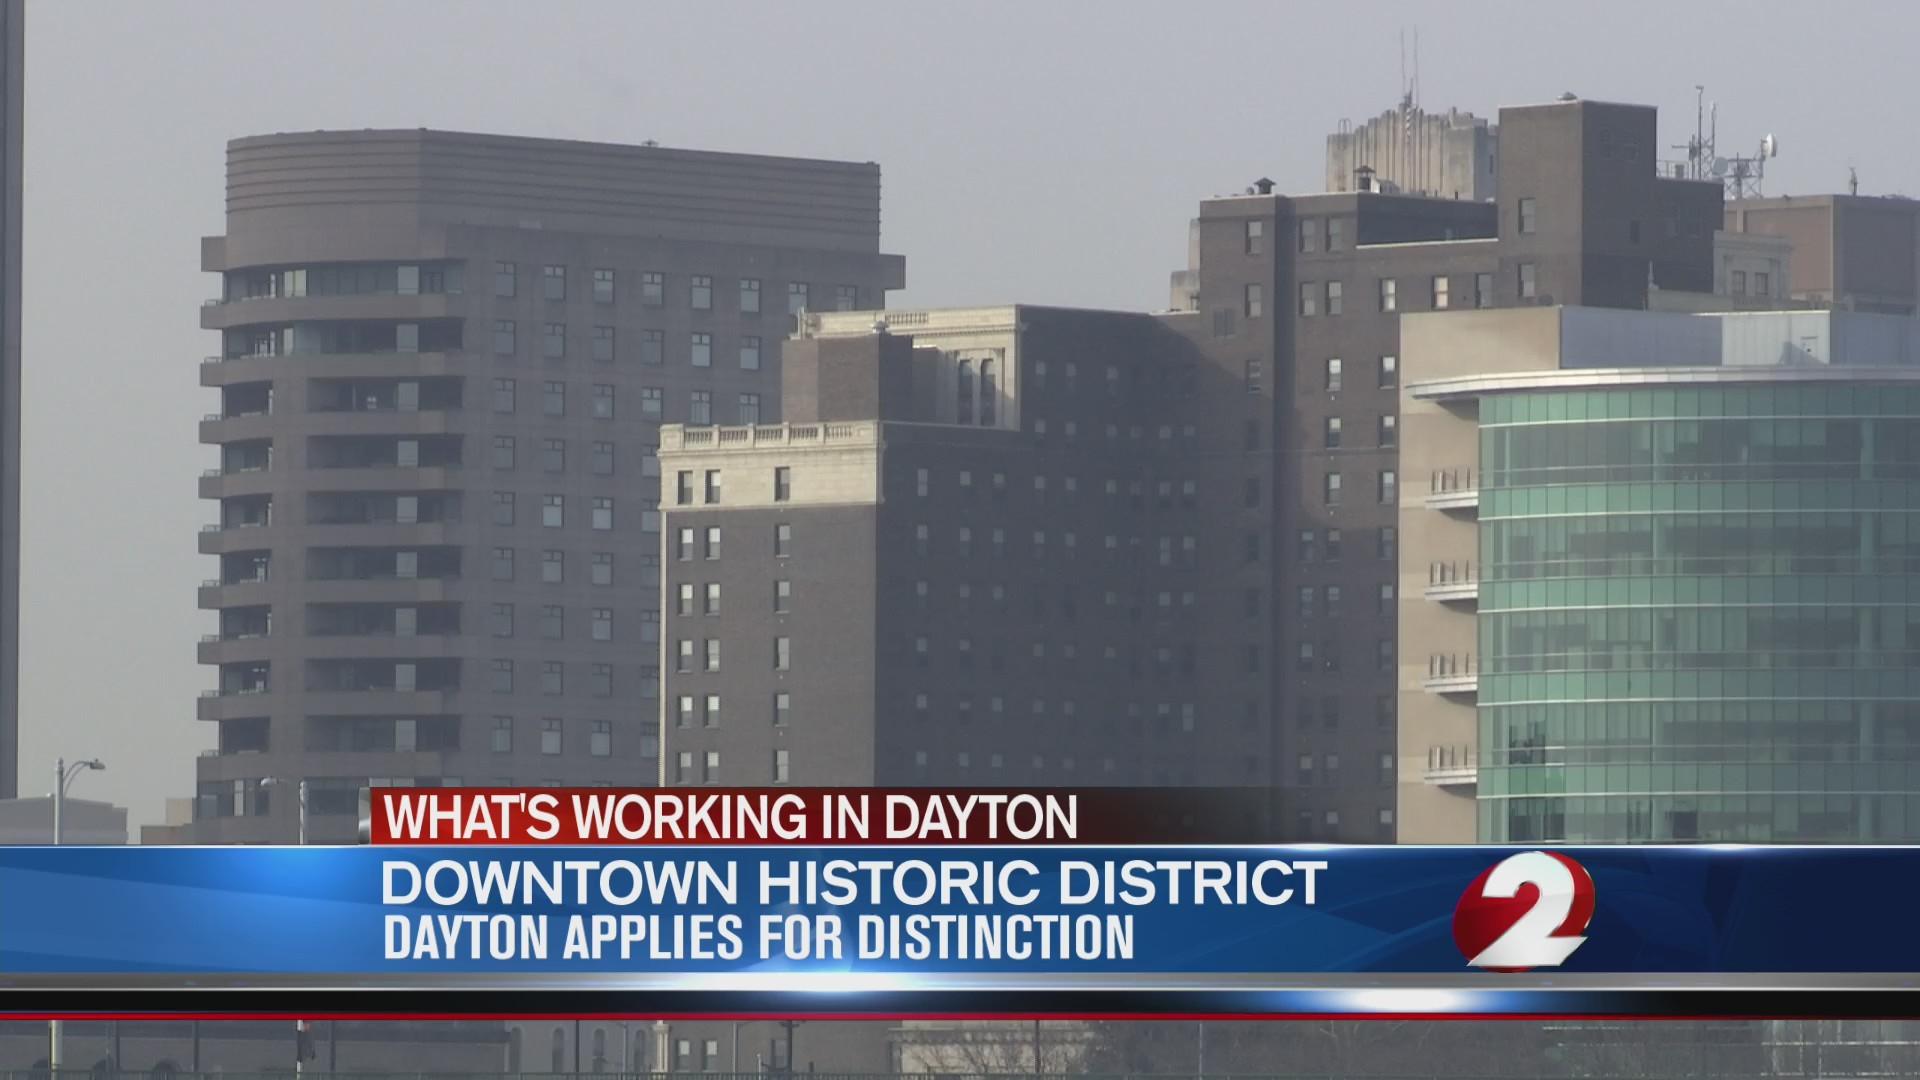 Downtown Dayton applies for distinction